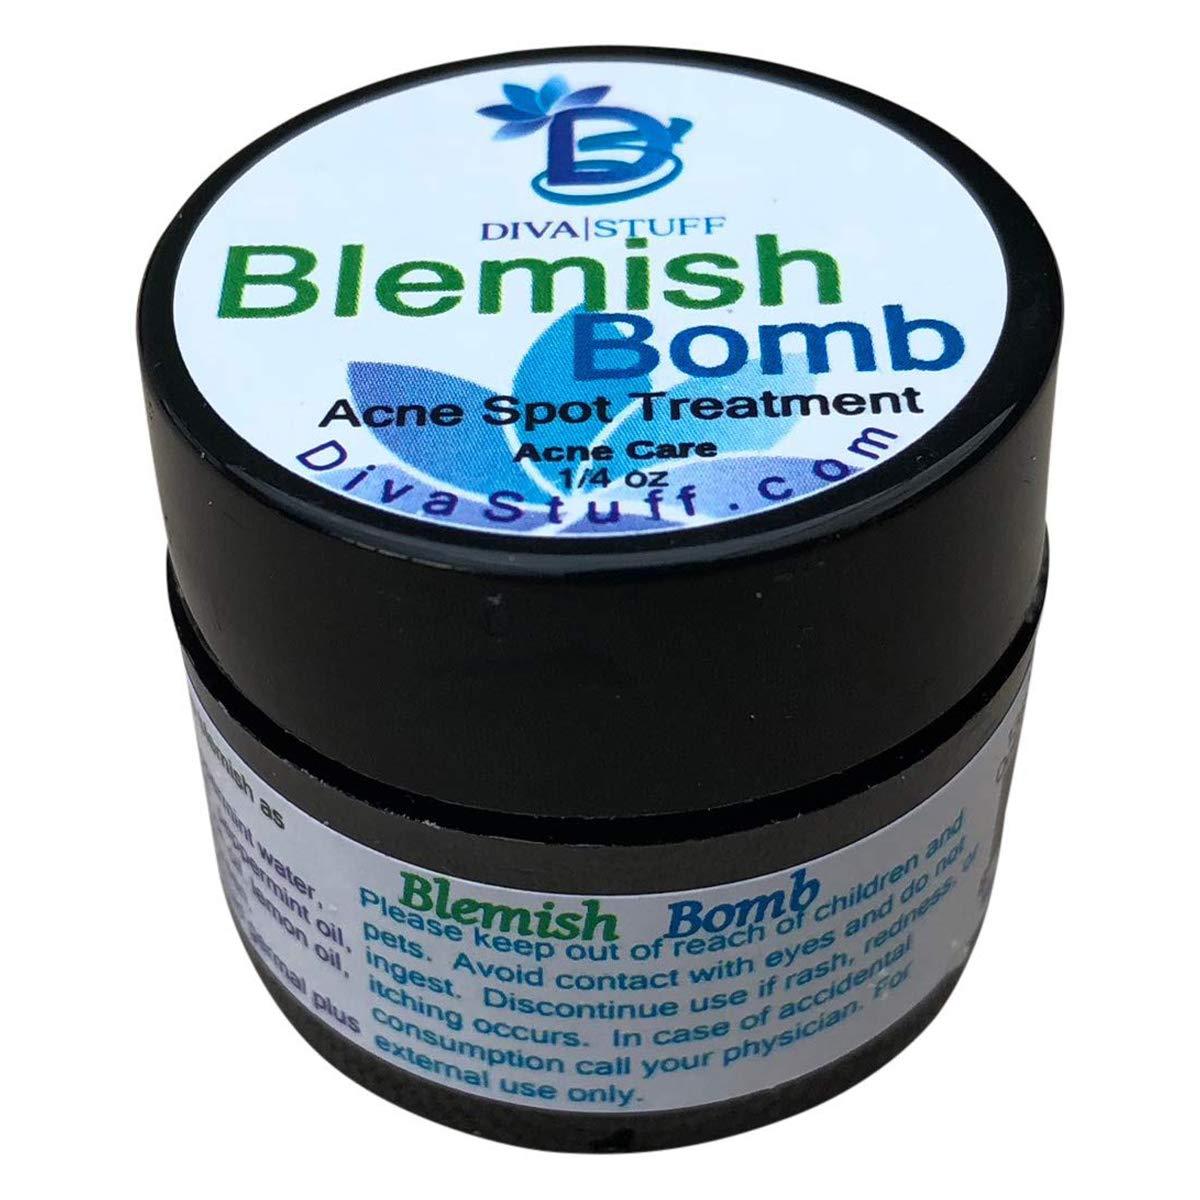 Diva Stuff Best Blemish Bomb Spot Treatment, Anti-acne spot treatment cream for Men and Women, 1/4 oz (Made in the USA)